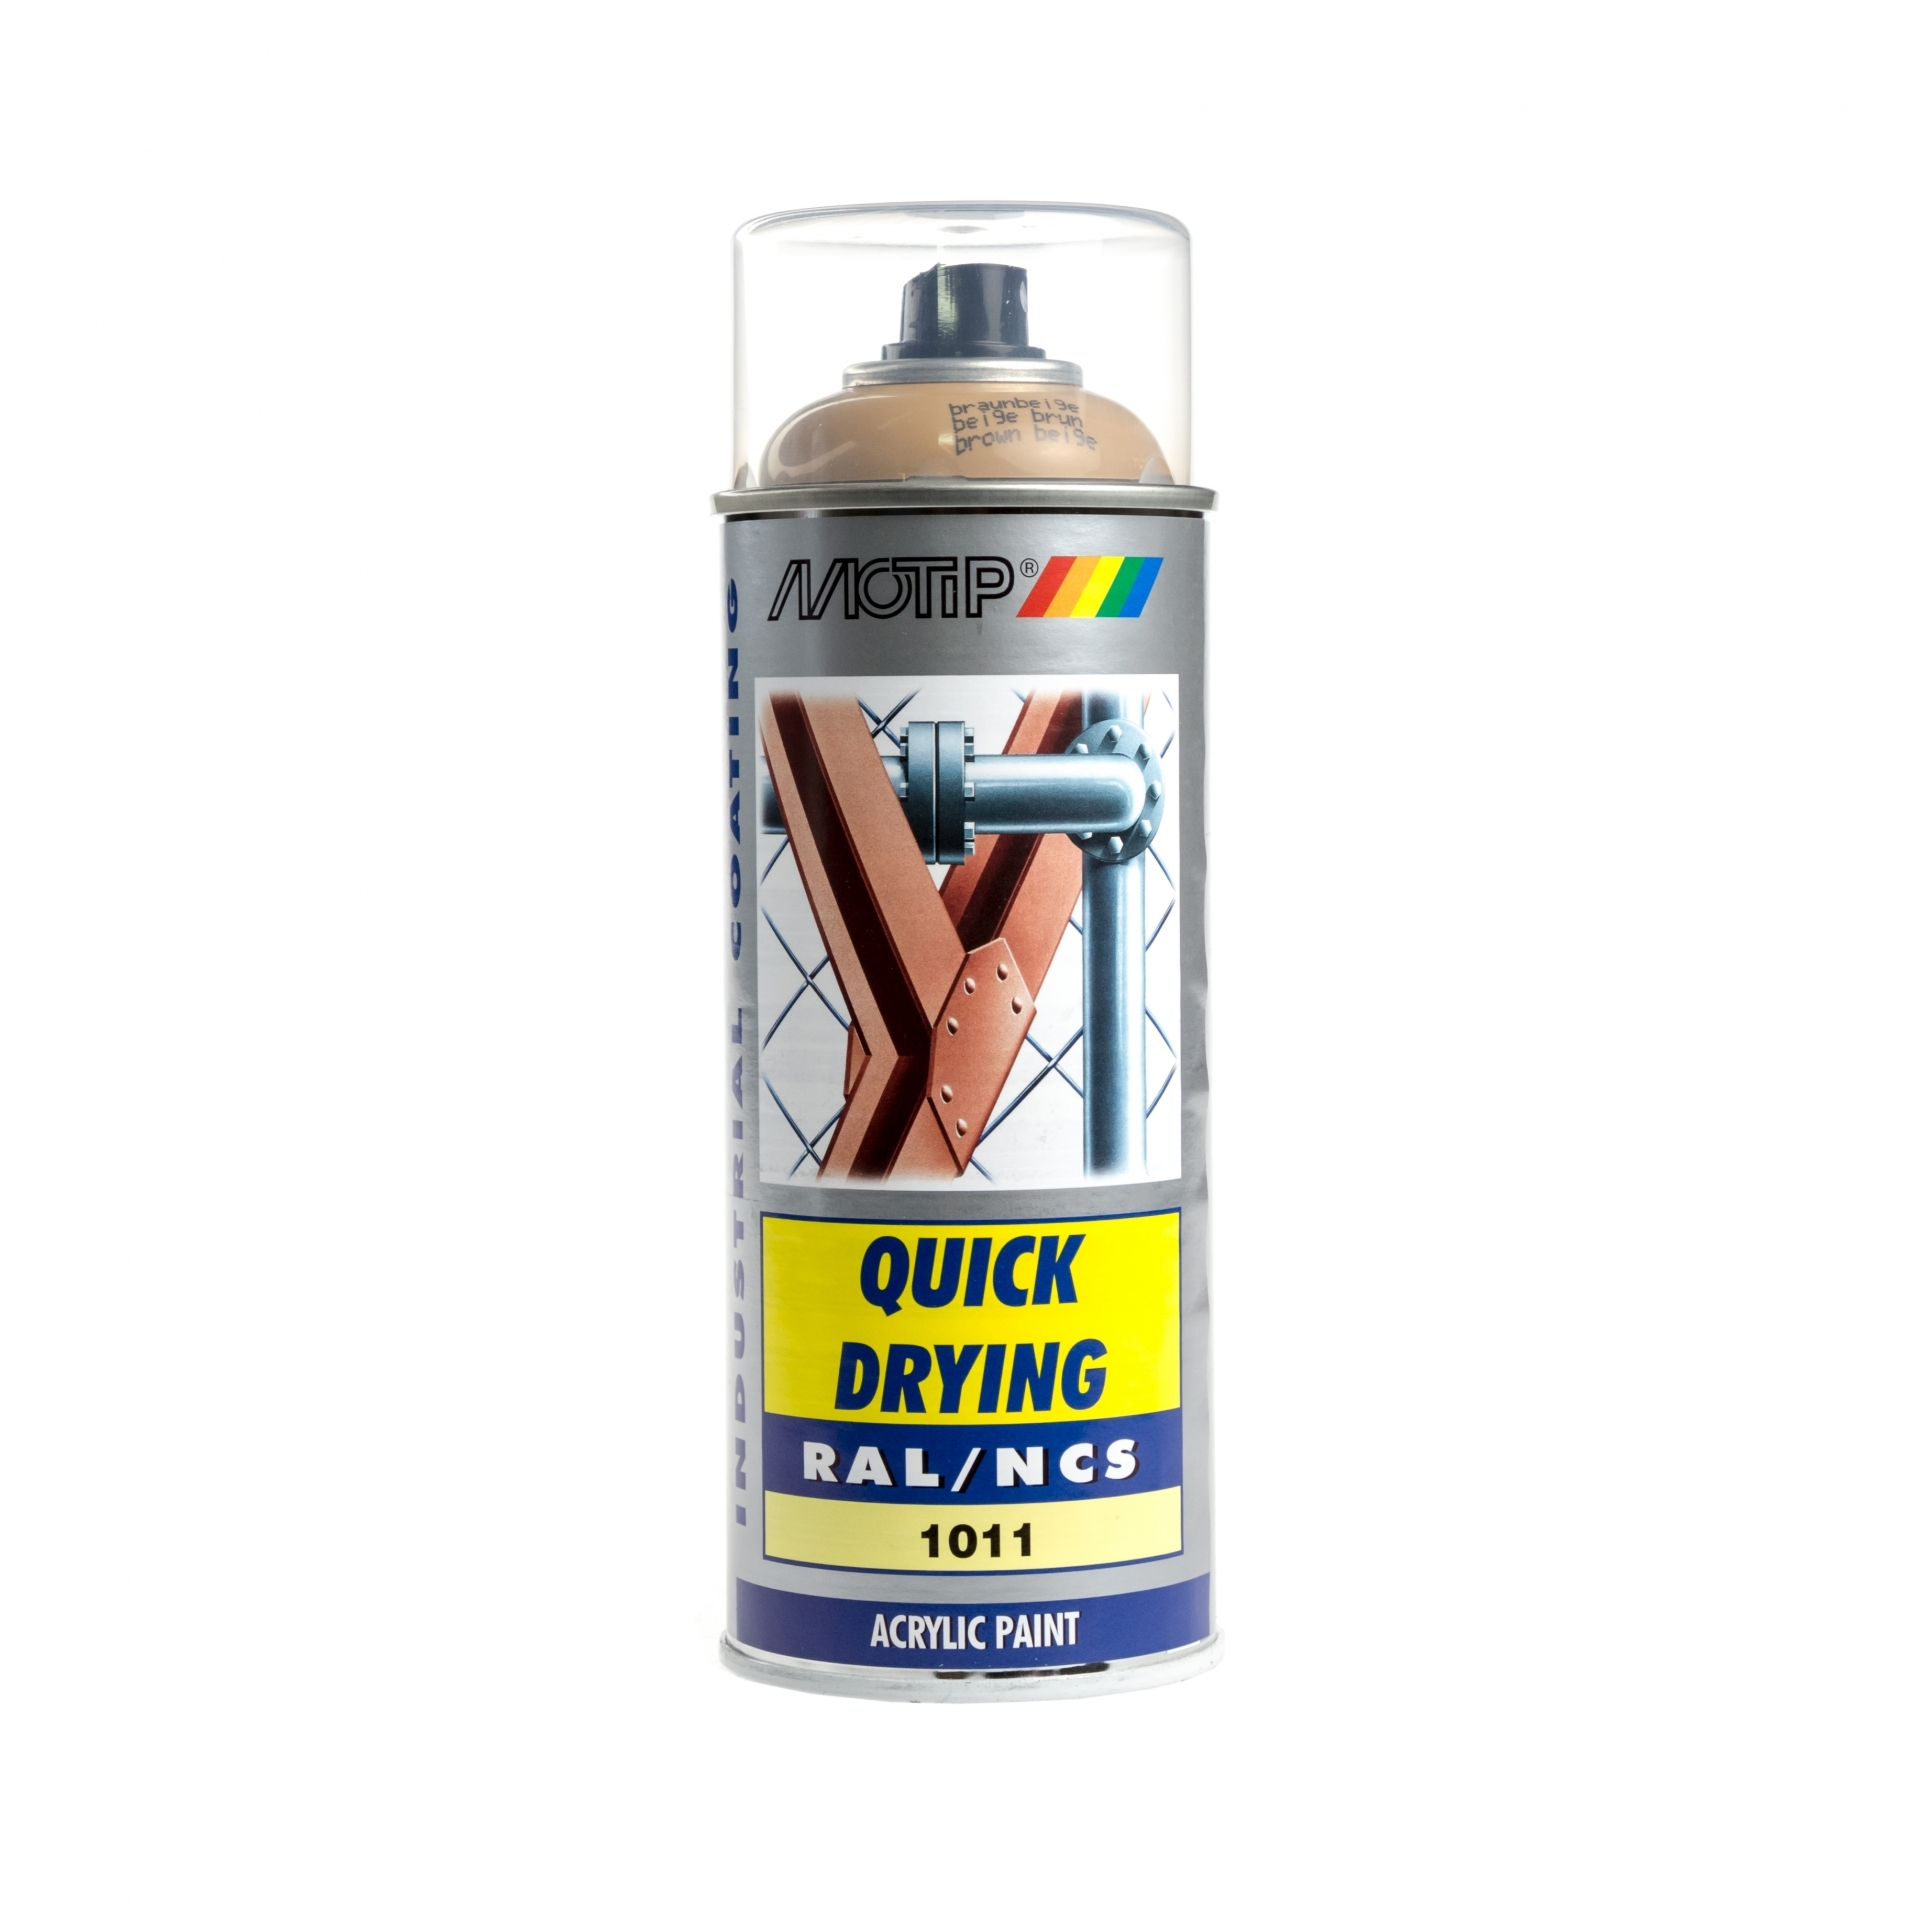 Bombe de peinture MoTip beige brun brillant acrylique RAL 1011 400 ml M07054